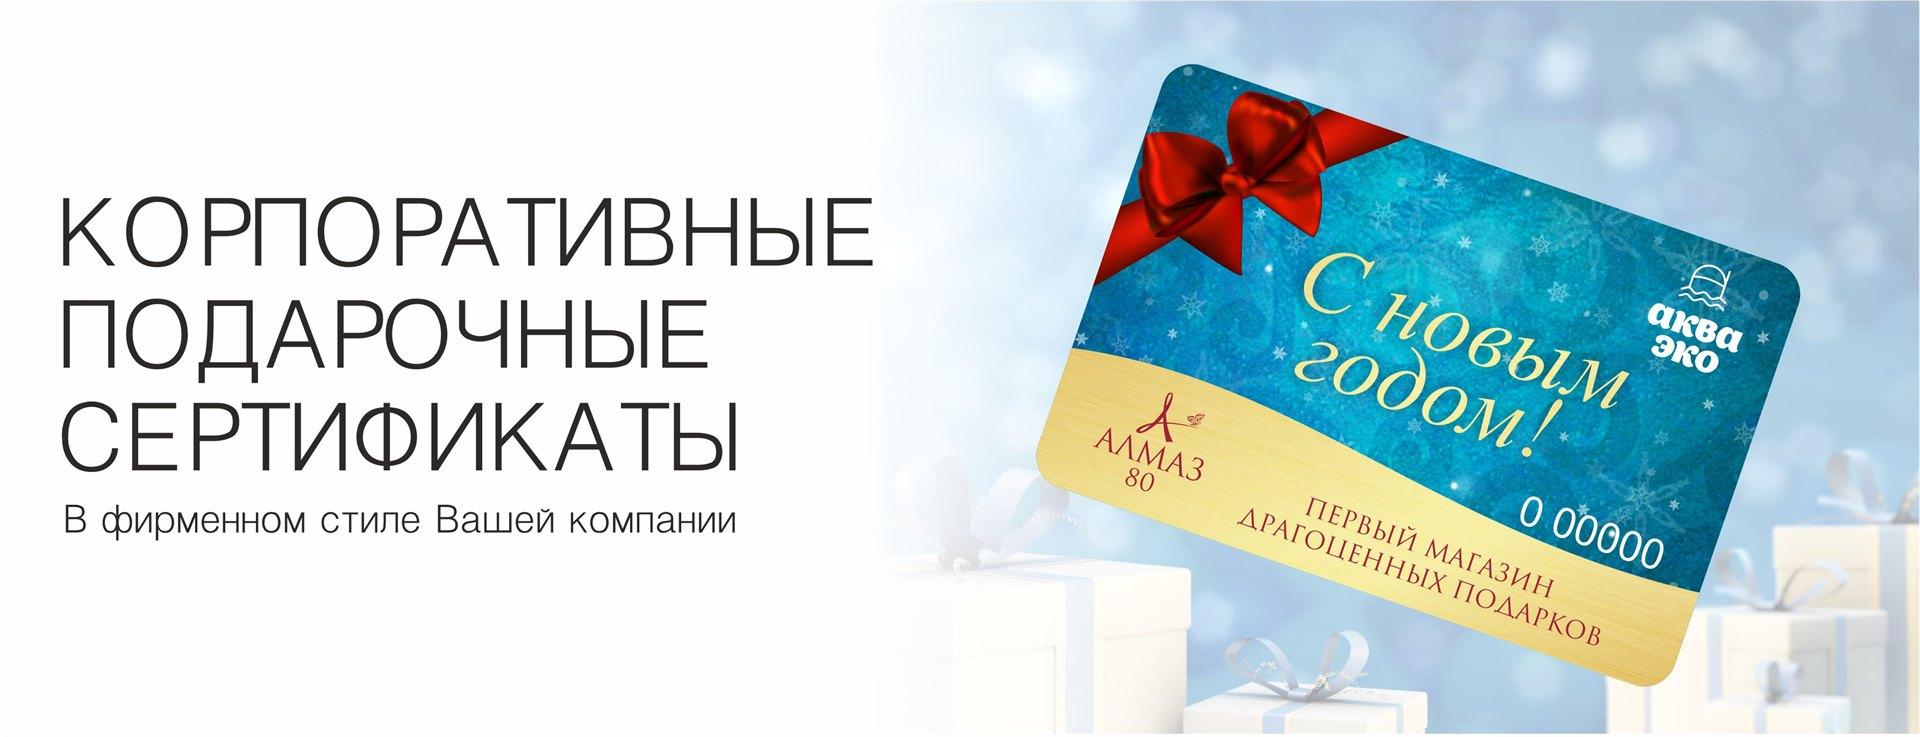 https://www.almazcom.ru/pub/img/QA/42/banner_na_sajt.jpg